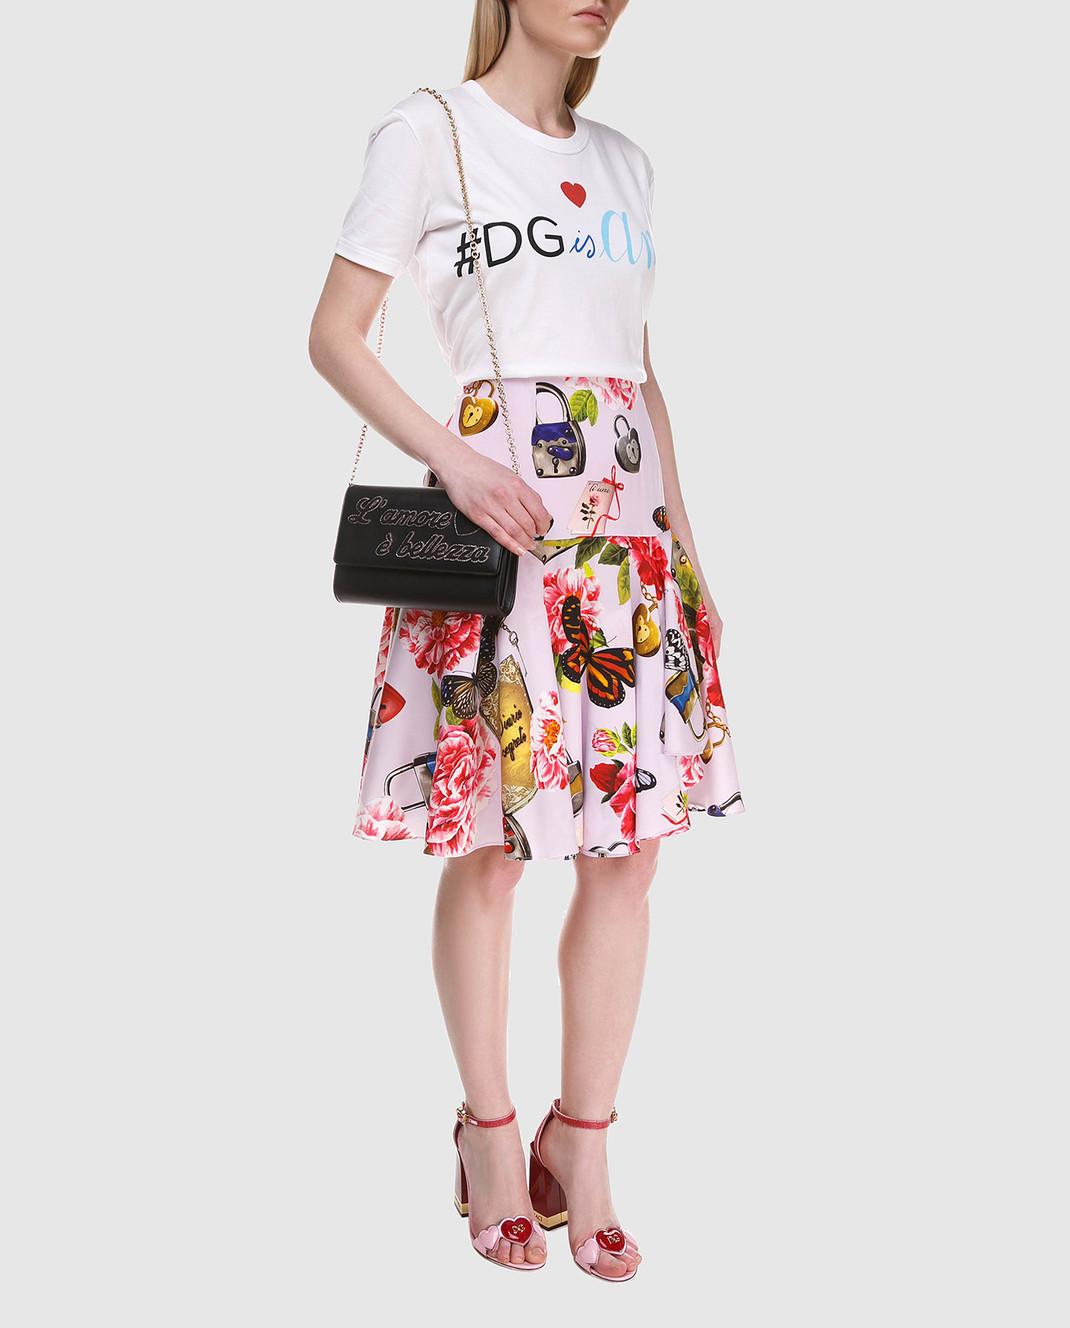 Dolce&Gabbana Юбка из шелка F4A8LTFSAUD изображение 2